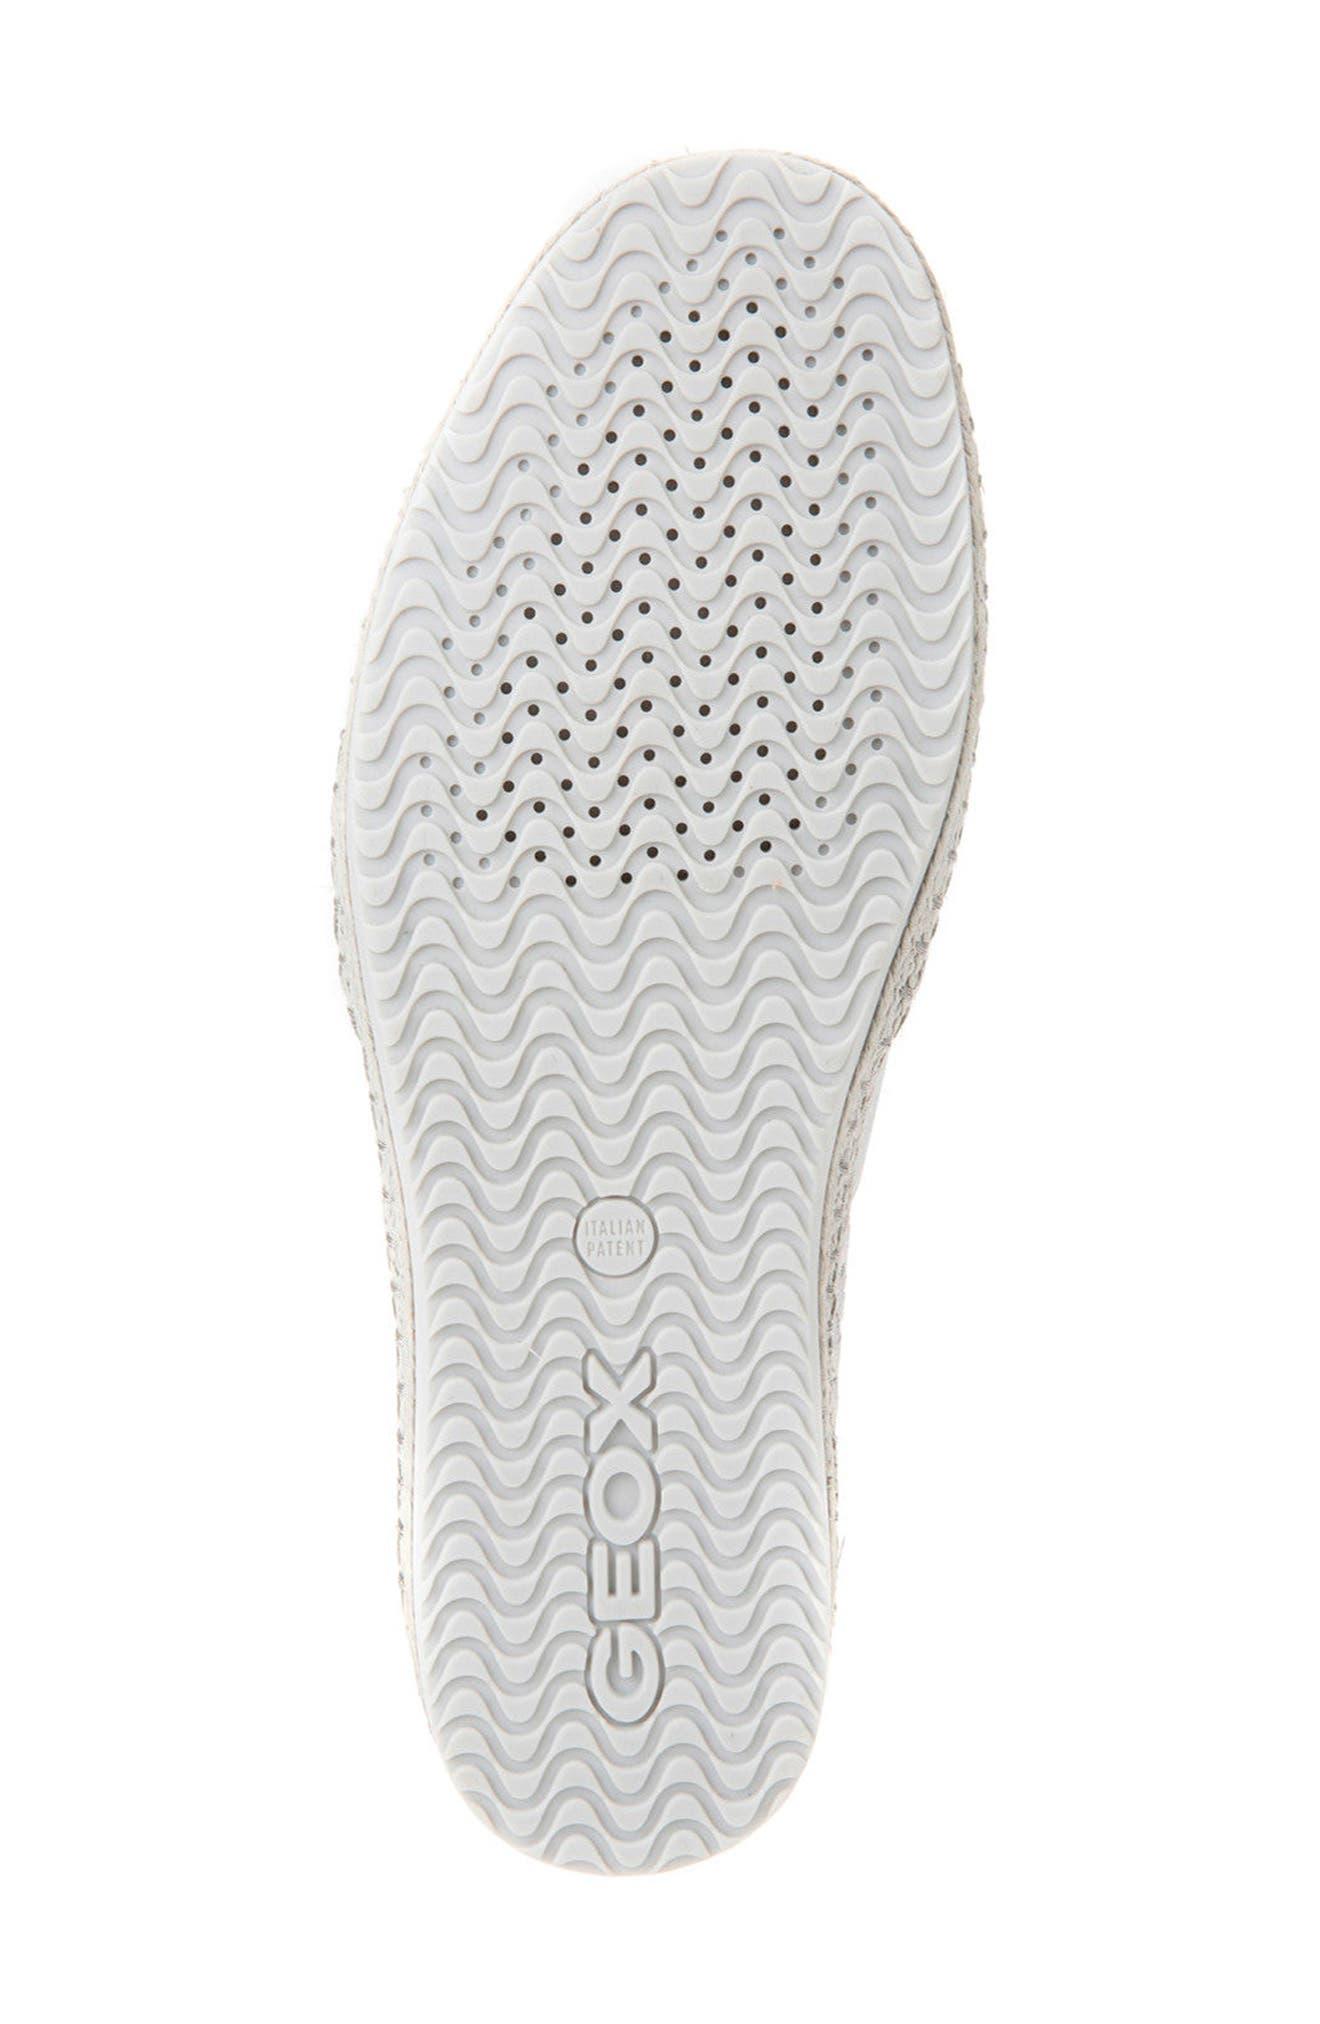 Copacaban 10 Woven Slip-On Sneaker,                             Alternate thumbnail 6, color,                             050